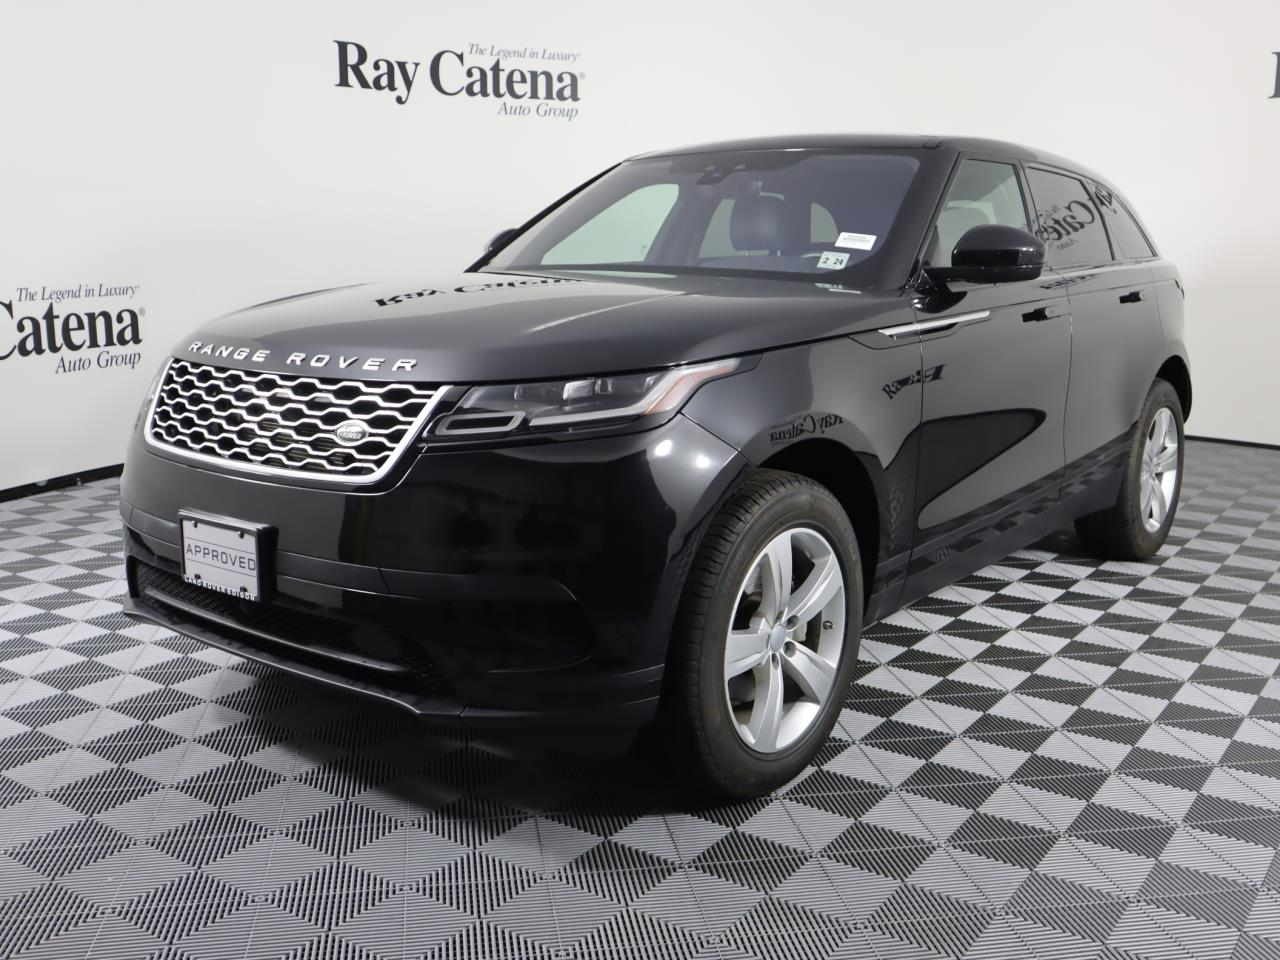 Certified Pre-Owned 2019 Land Rover Range Rover Velar P250 S